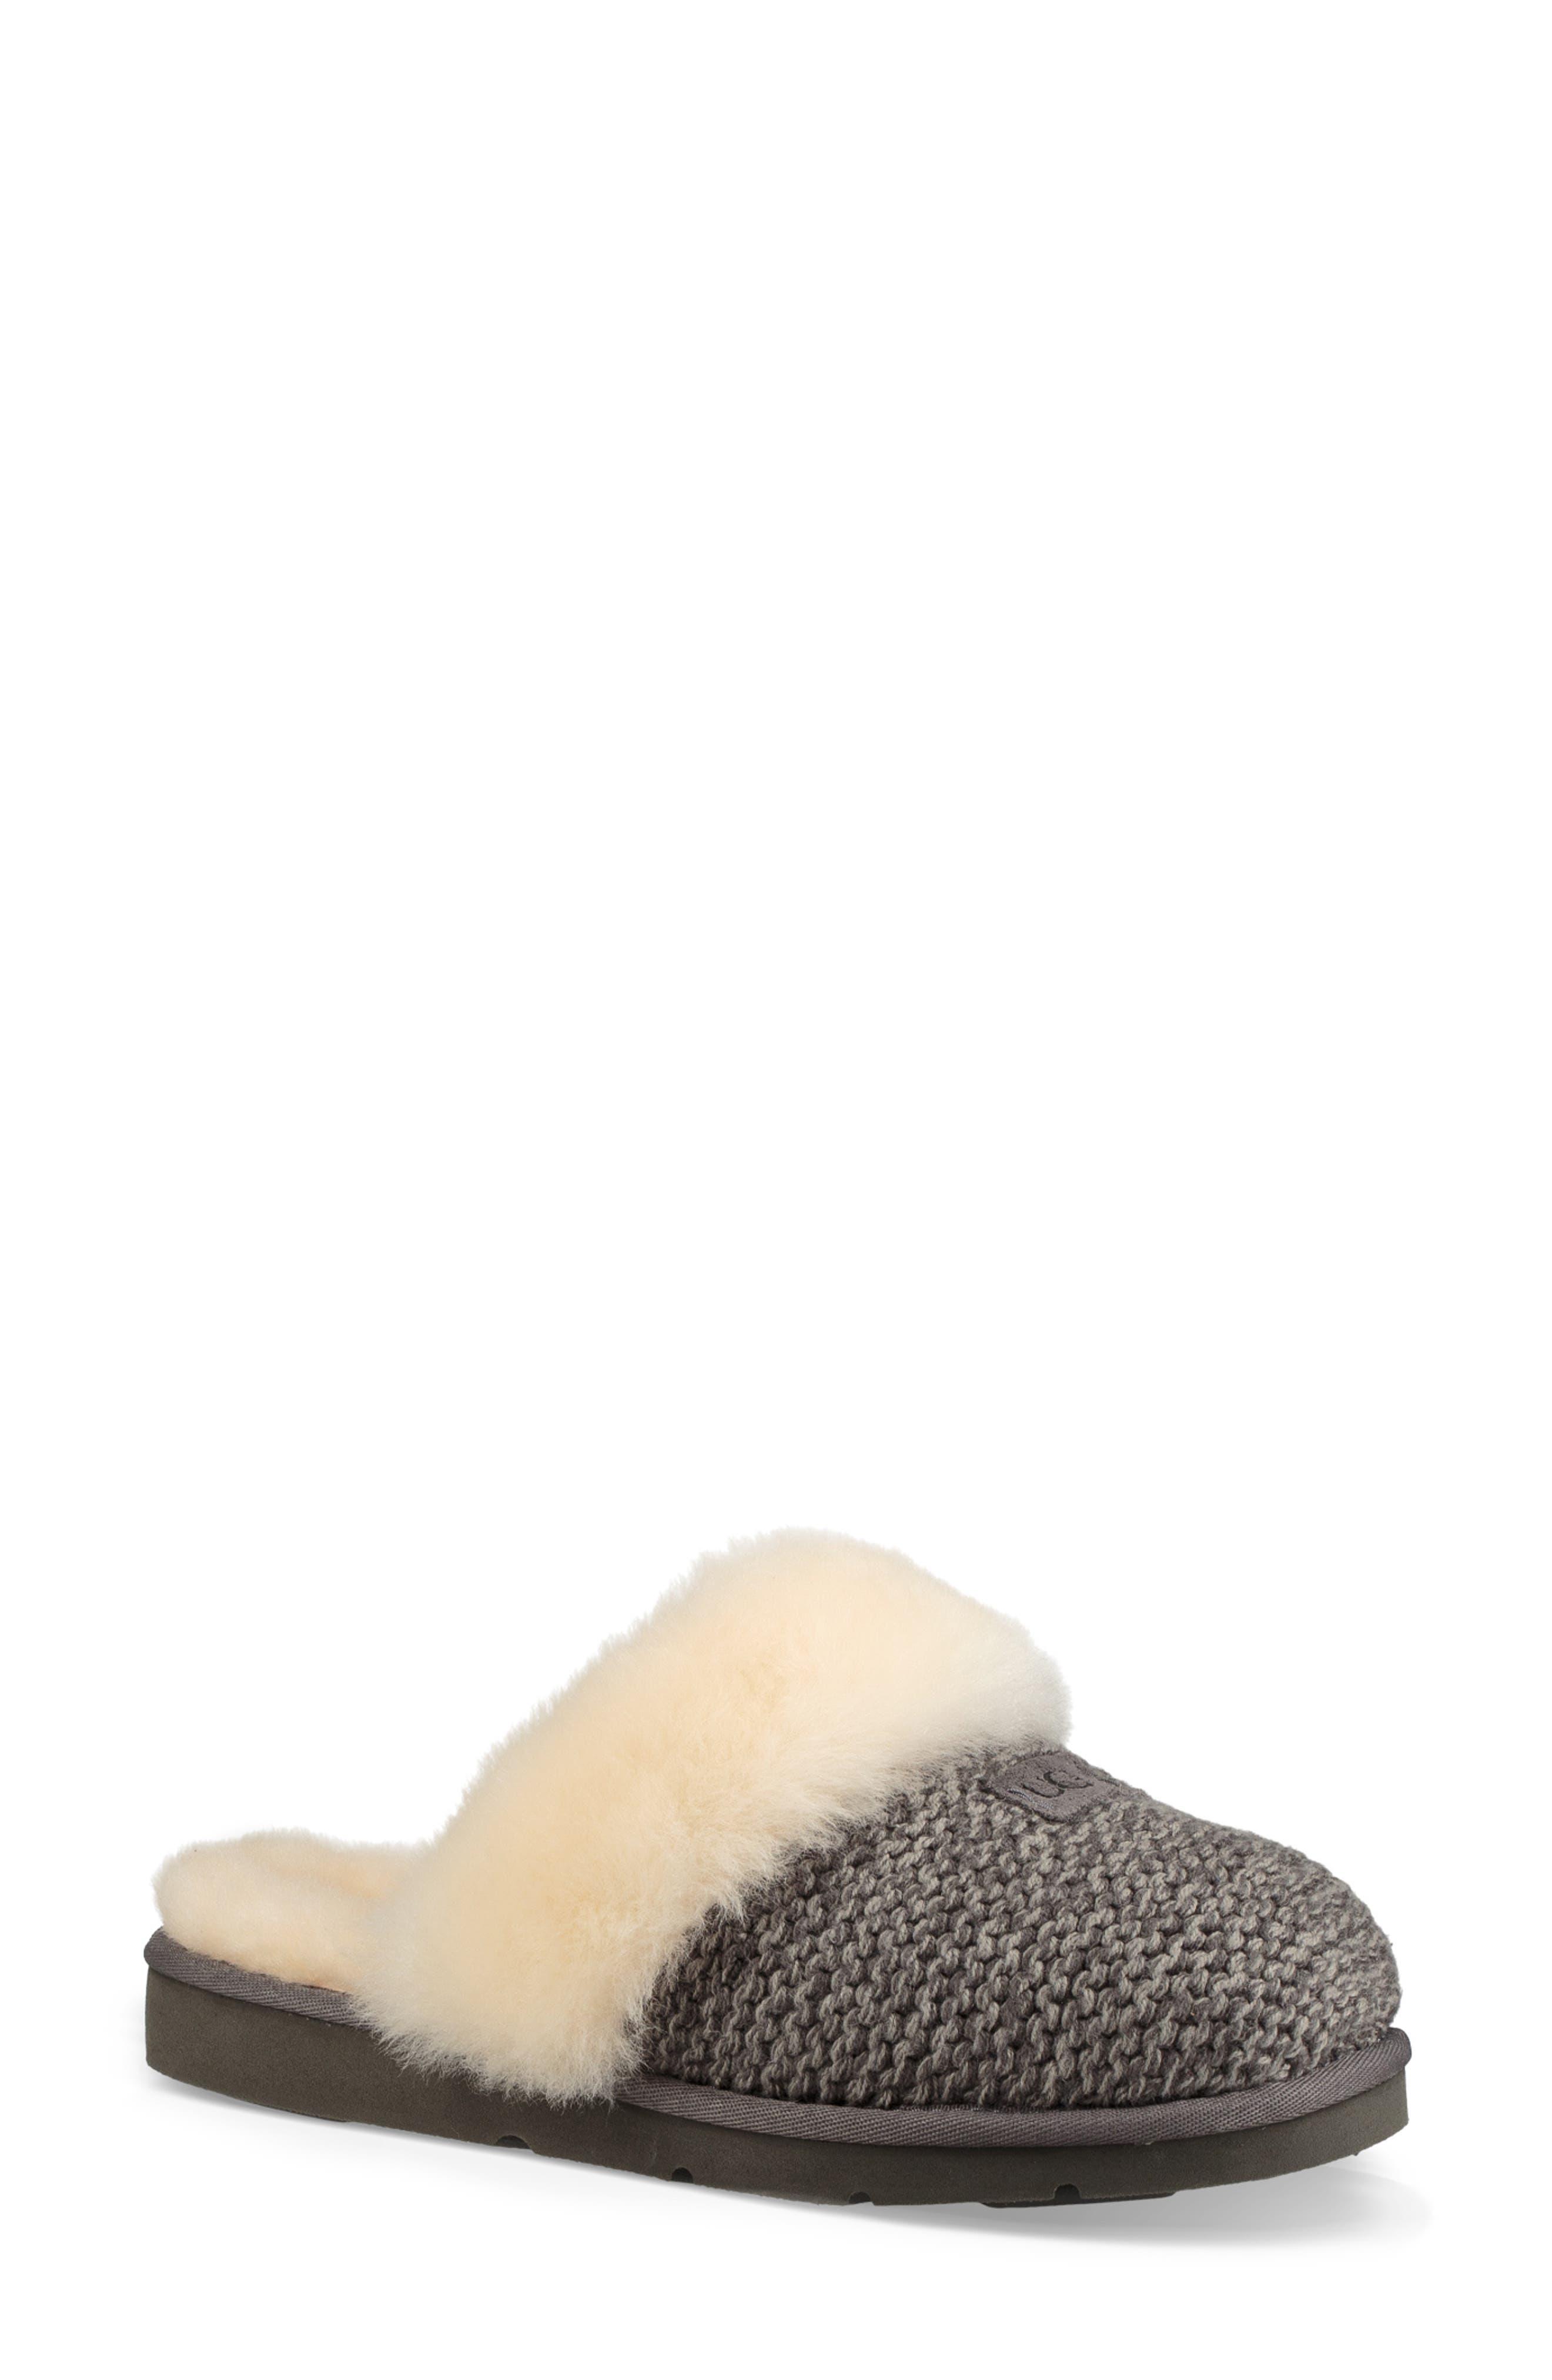 Ugg Cozy Knit Genuine Shearling Slipper, Grey